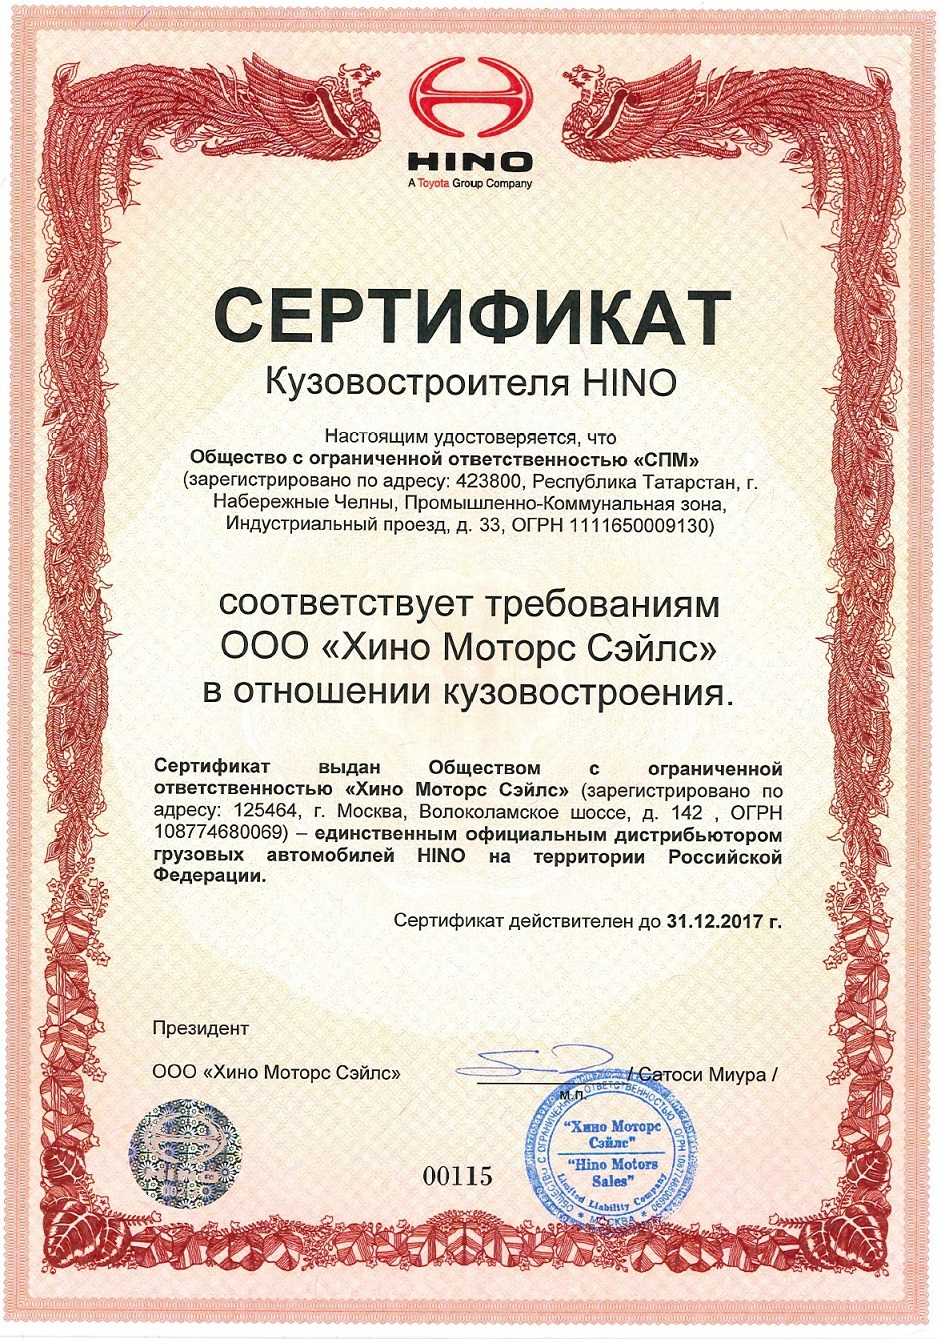 Сертификат кузовостроителя Hino